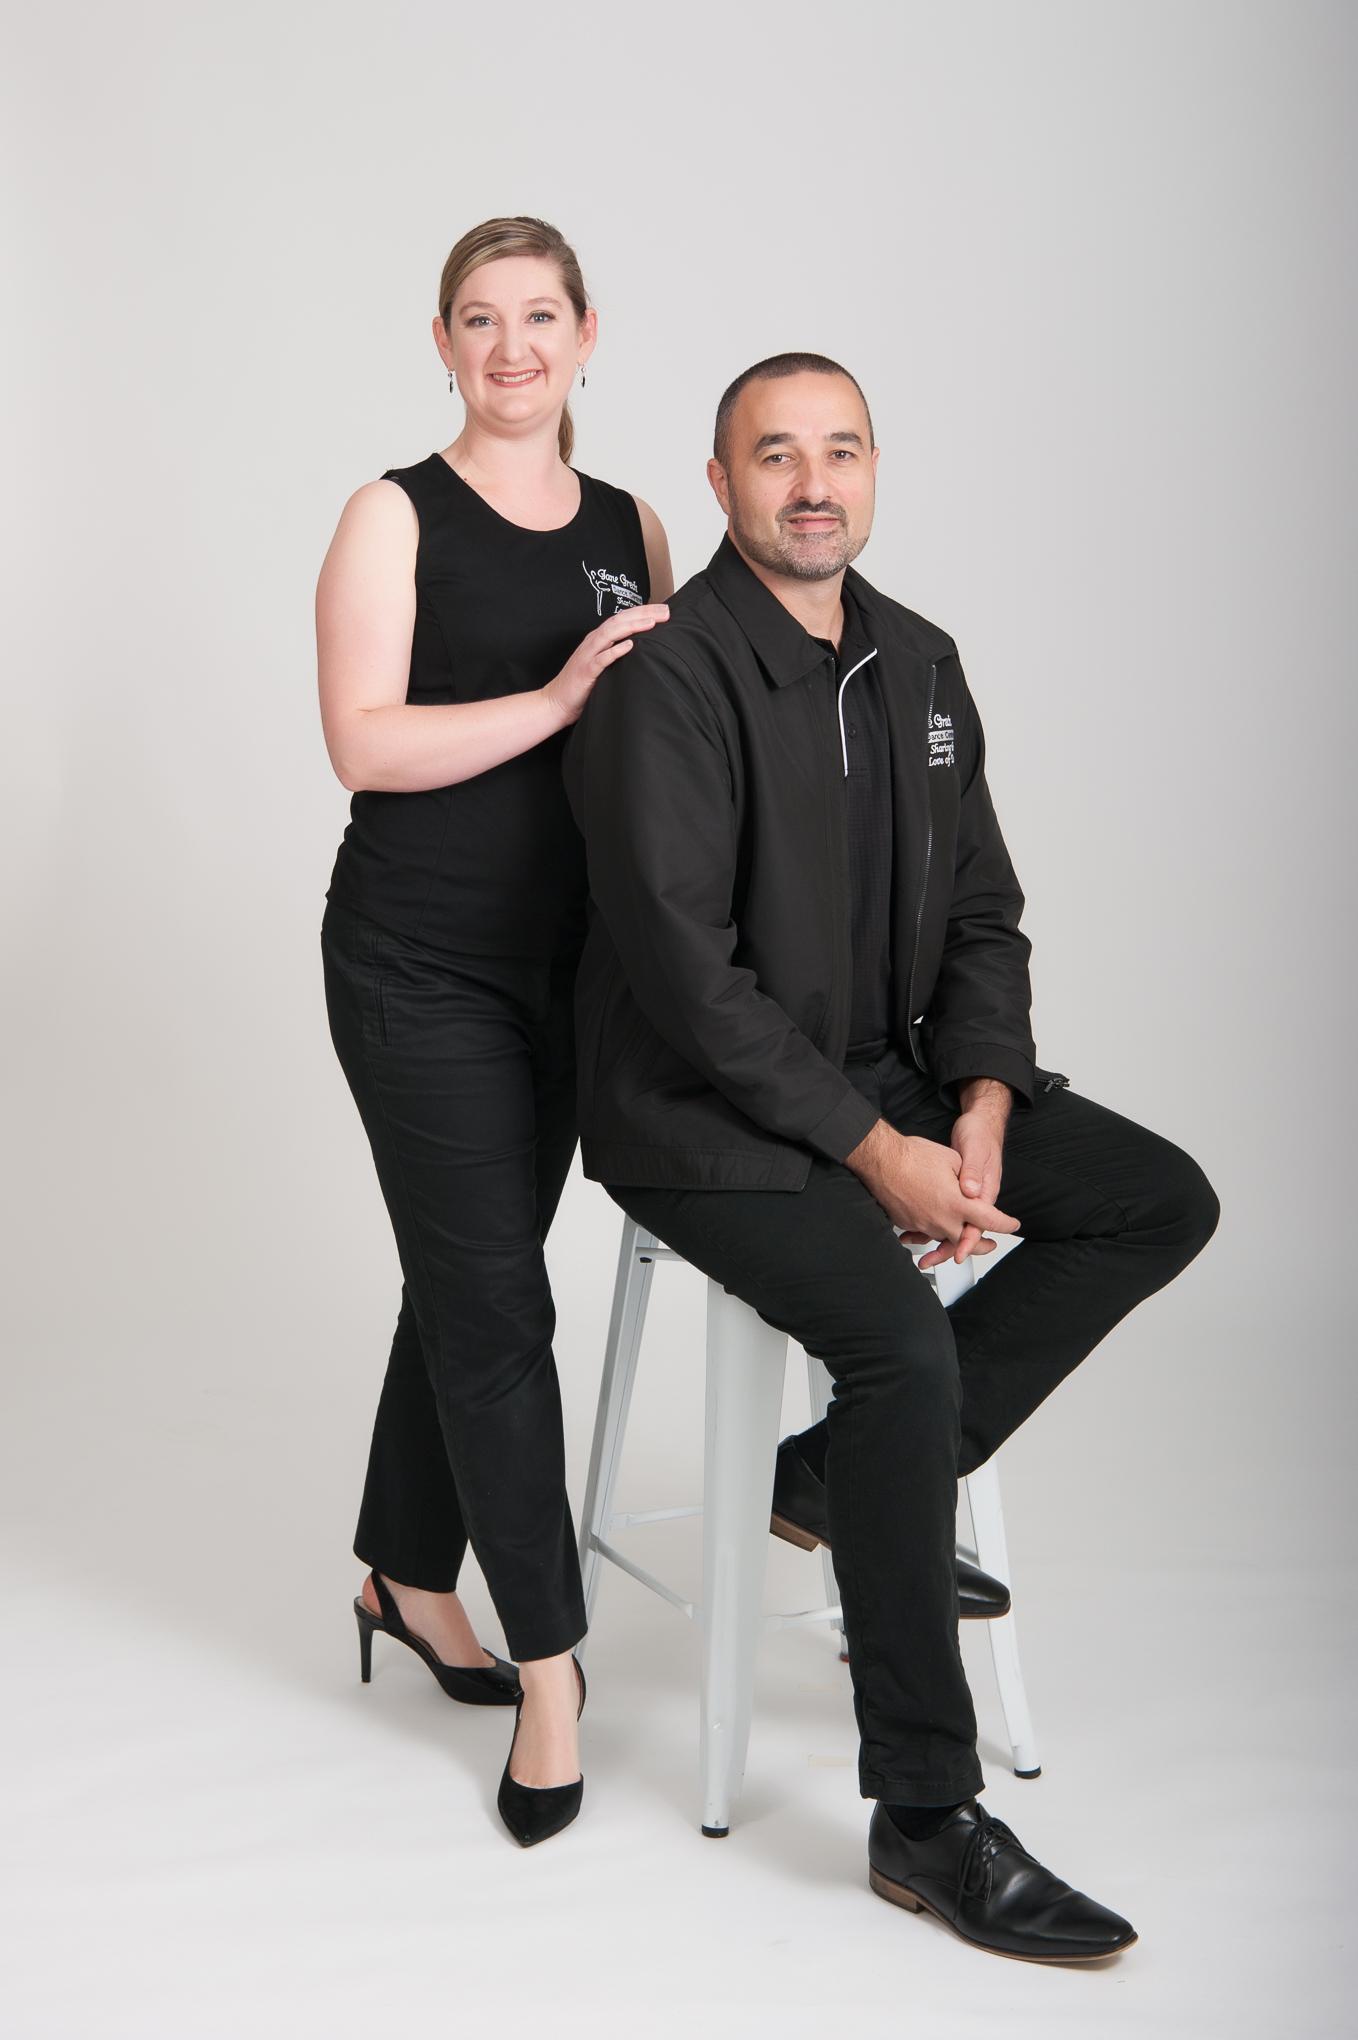 Full length head to toe studio business portrait